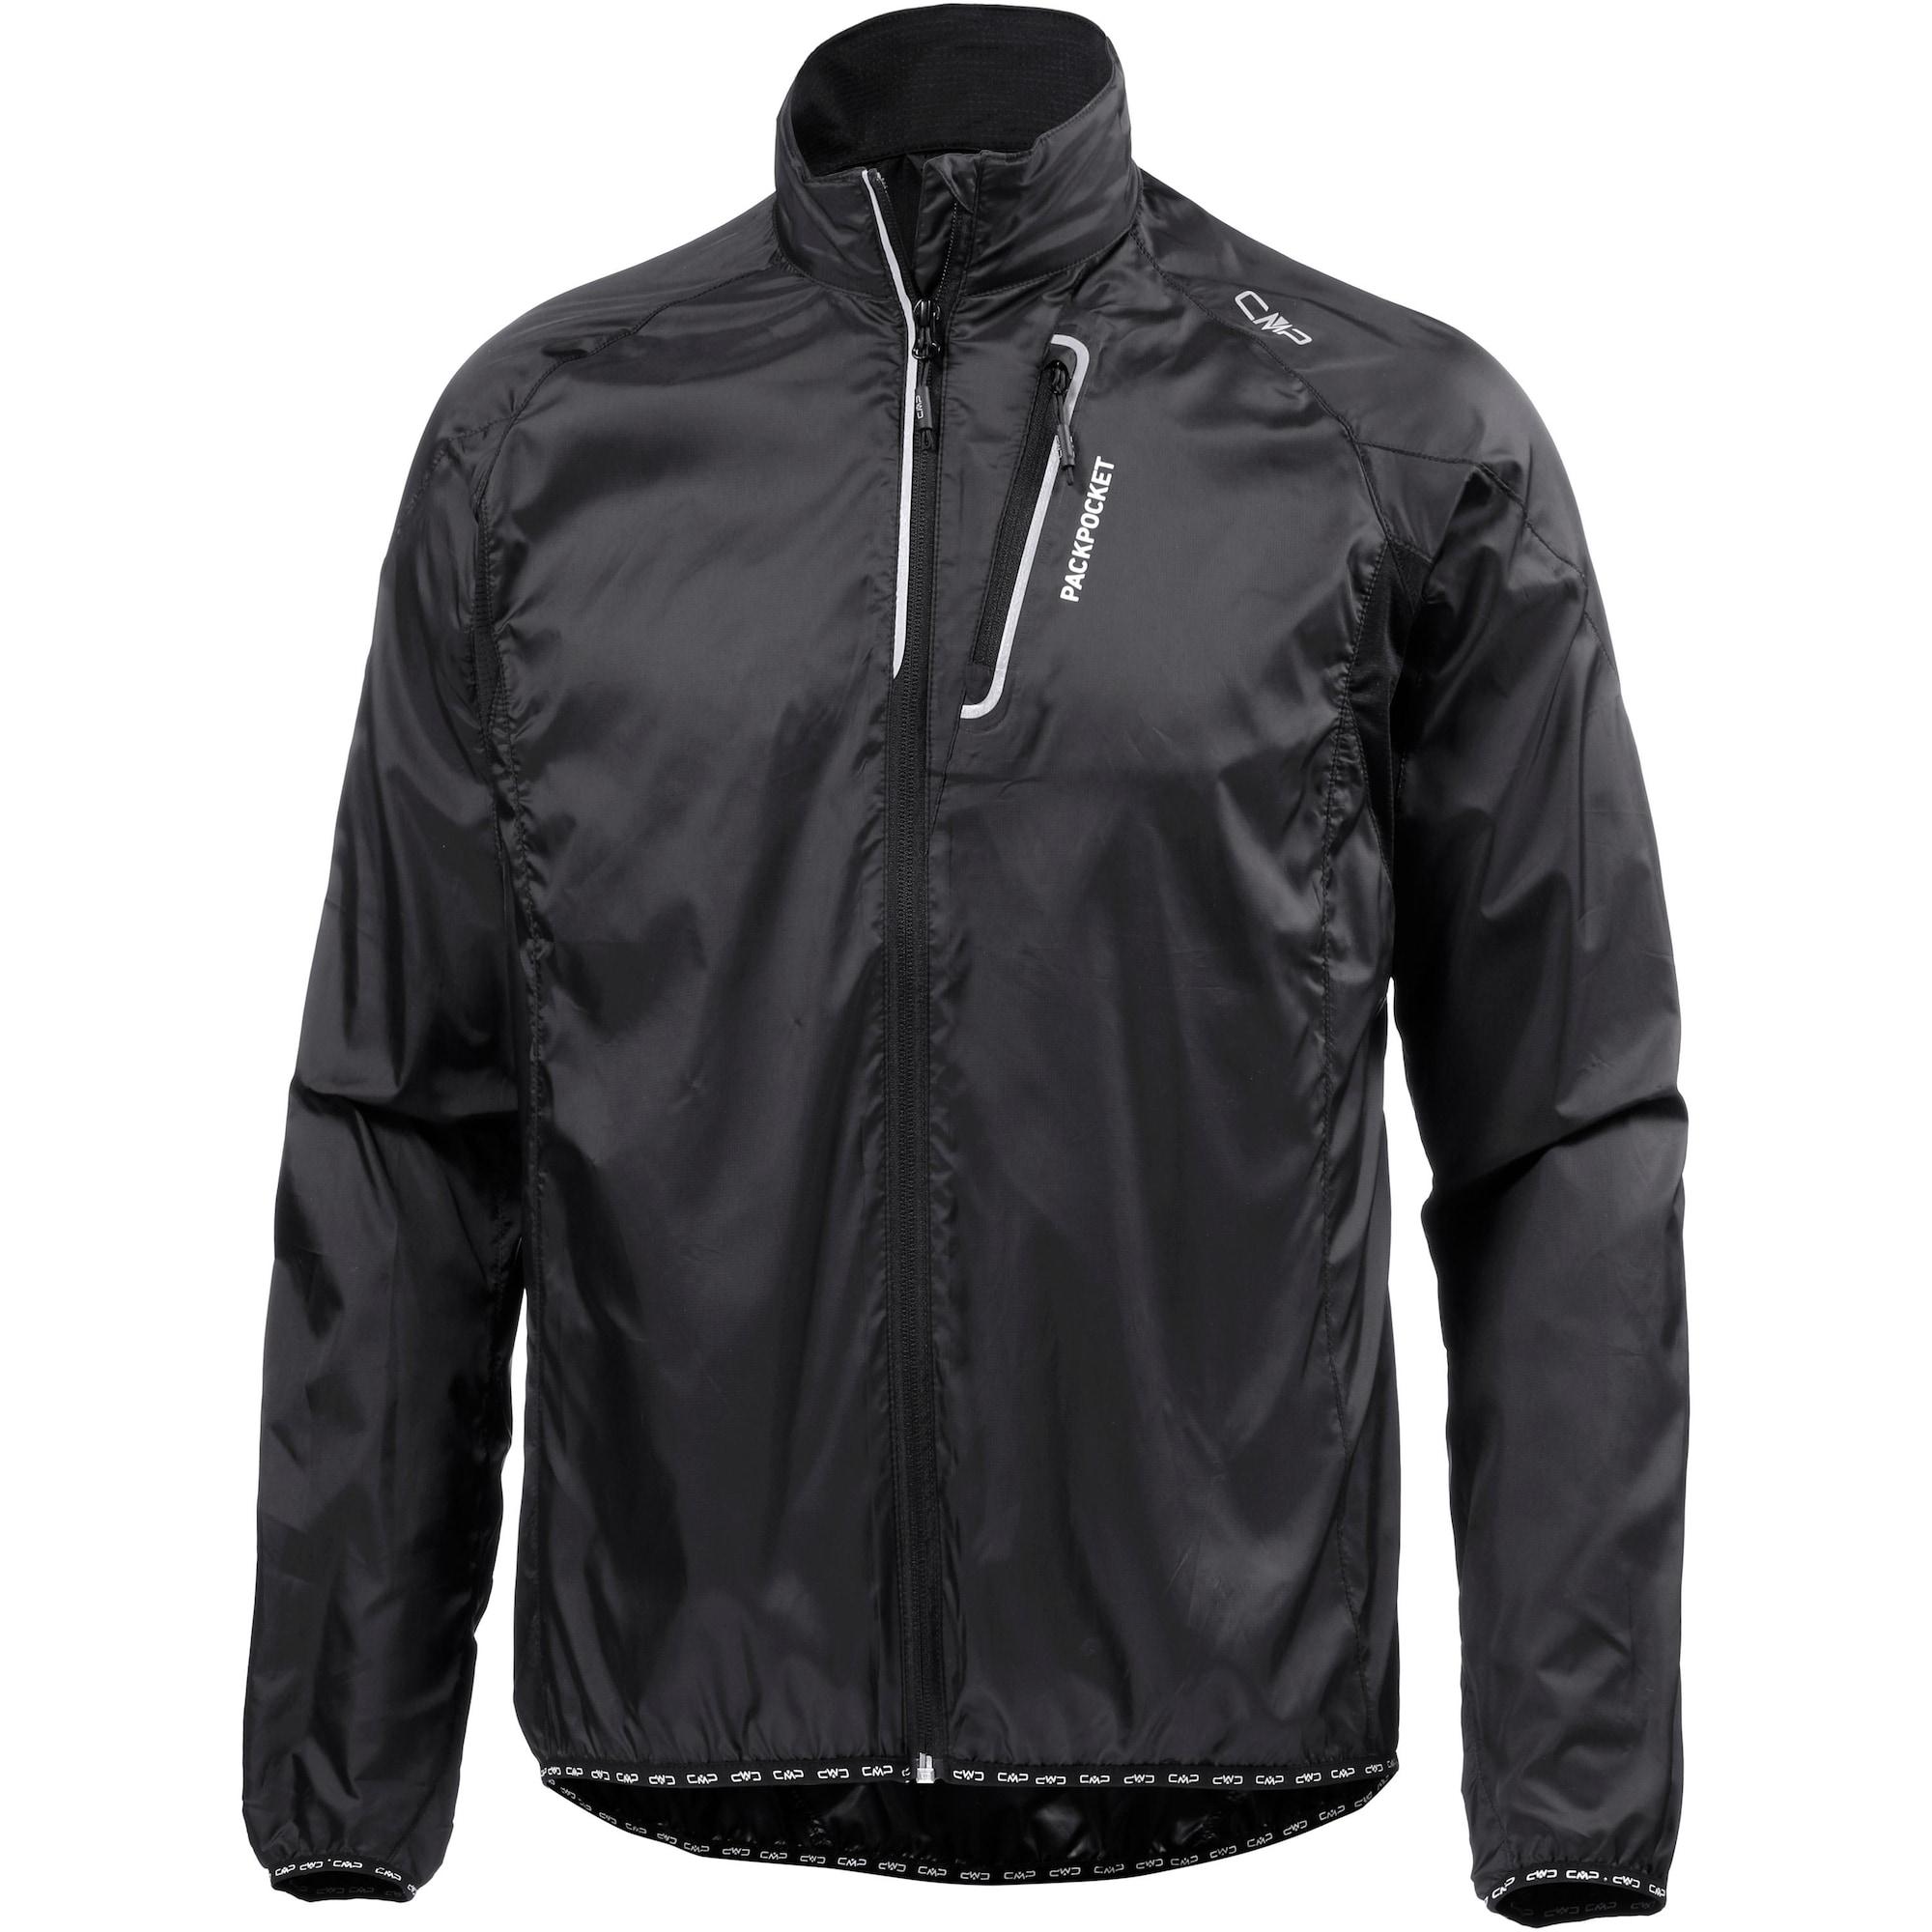 Fahrradjacke 'Trail Jacket' | Sportbekleidung > Sportjacken > Fahrradjacken | CMP